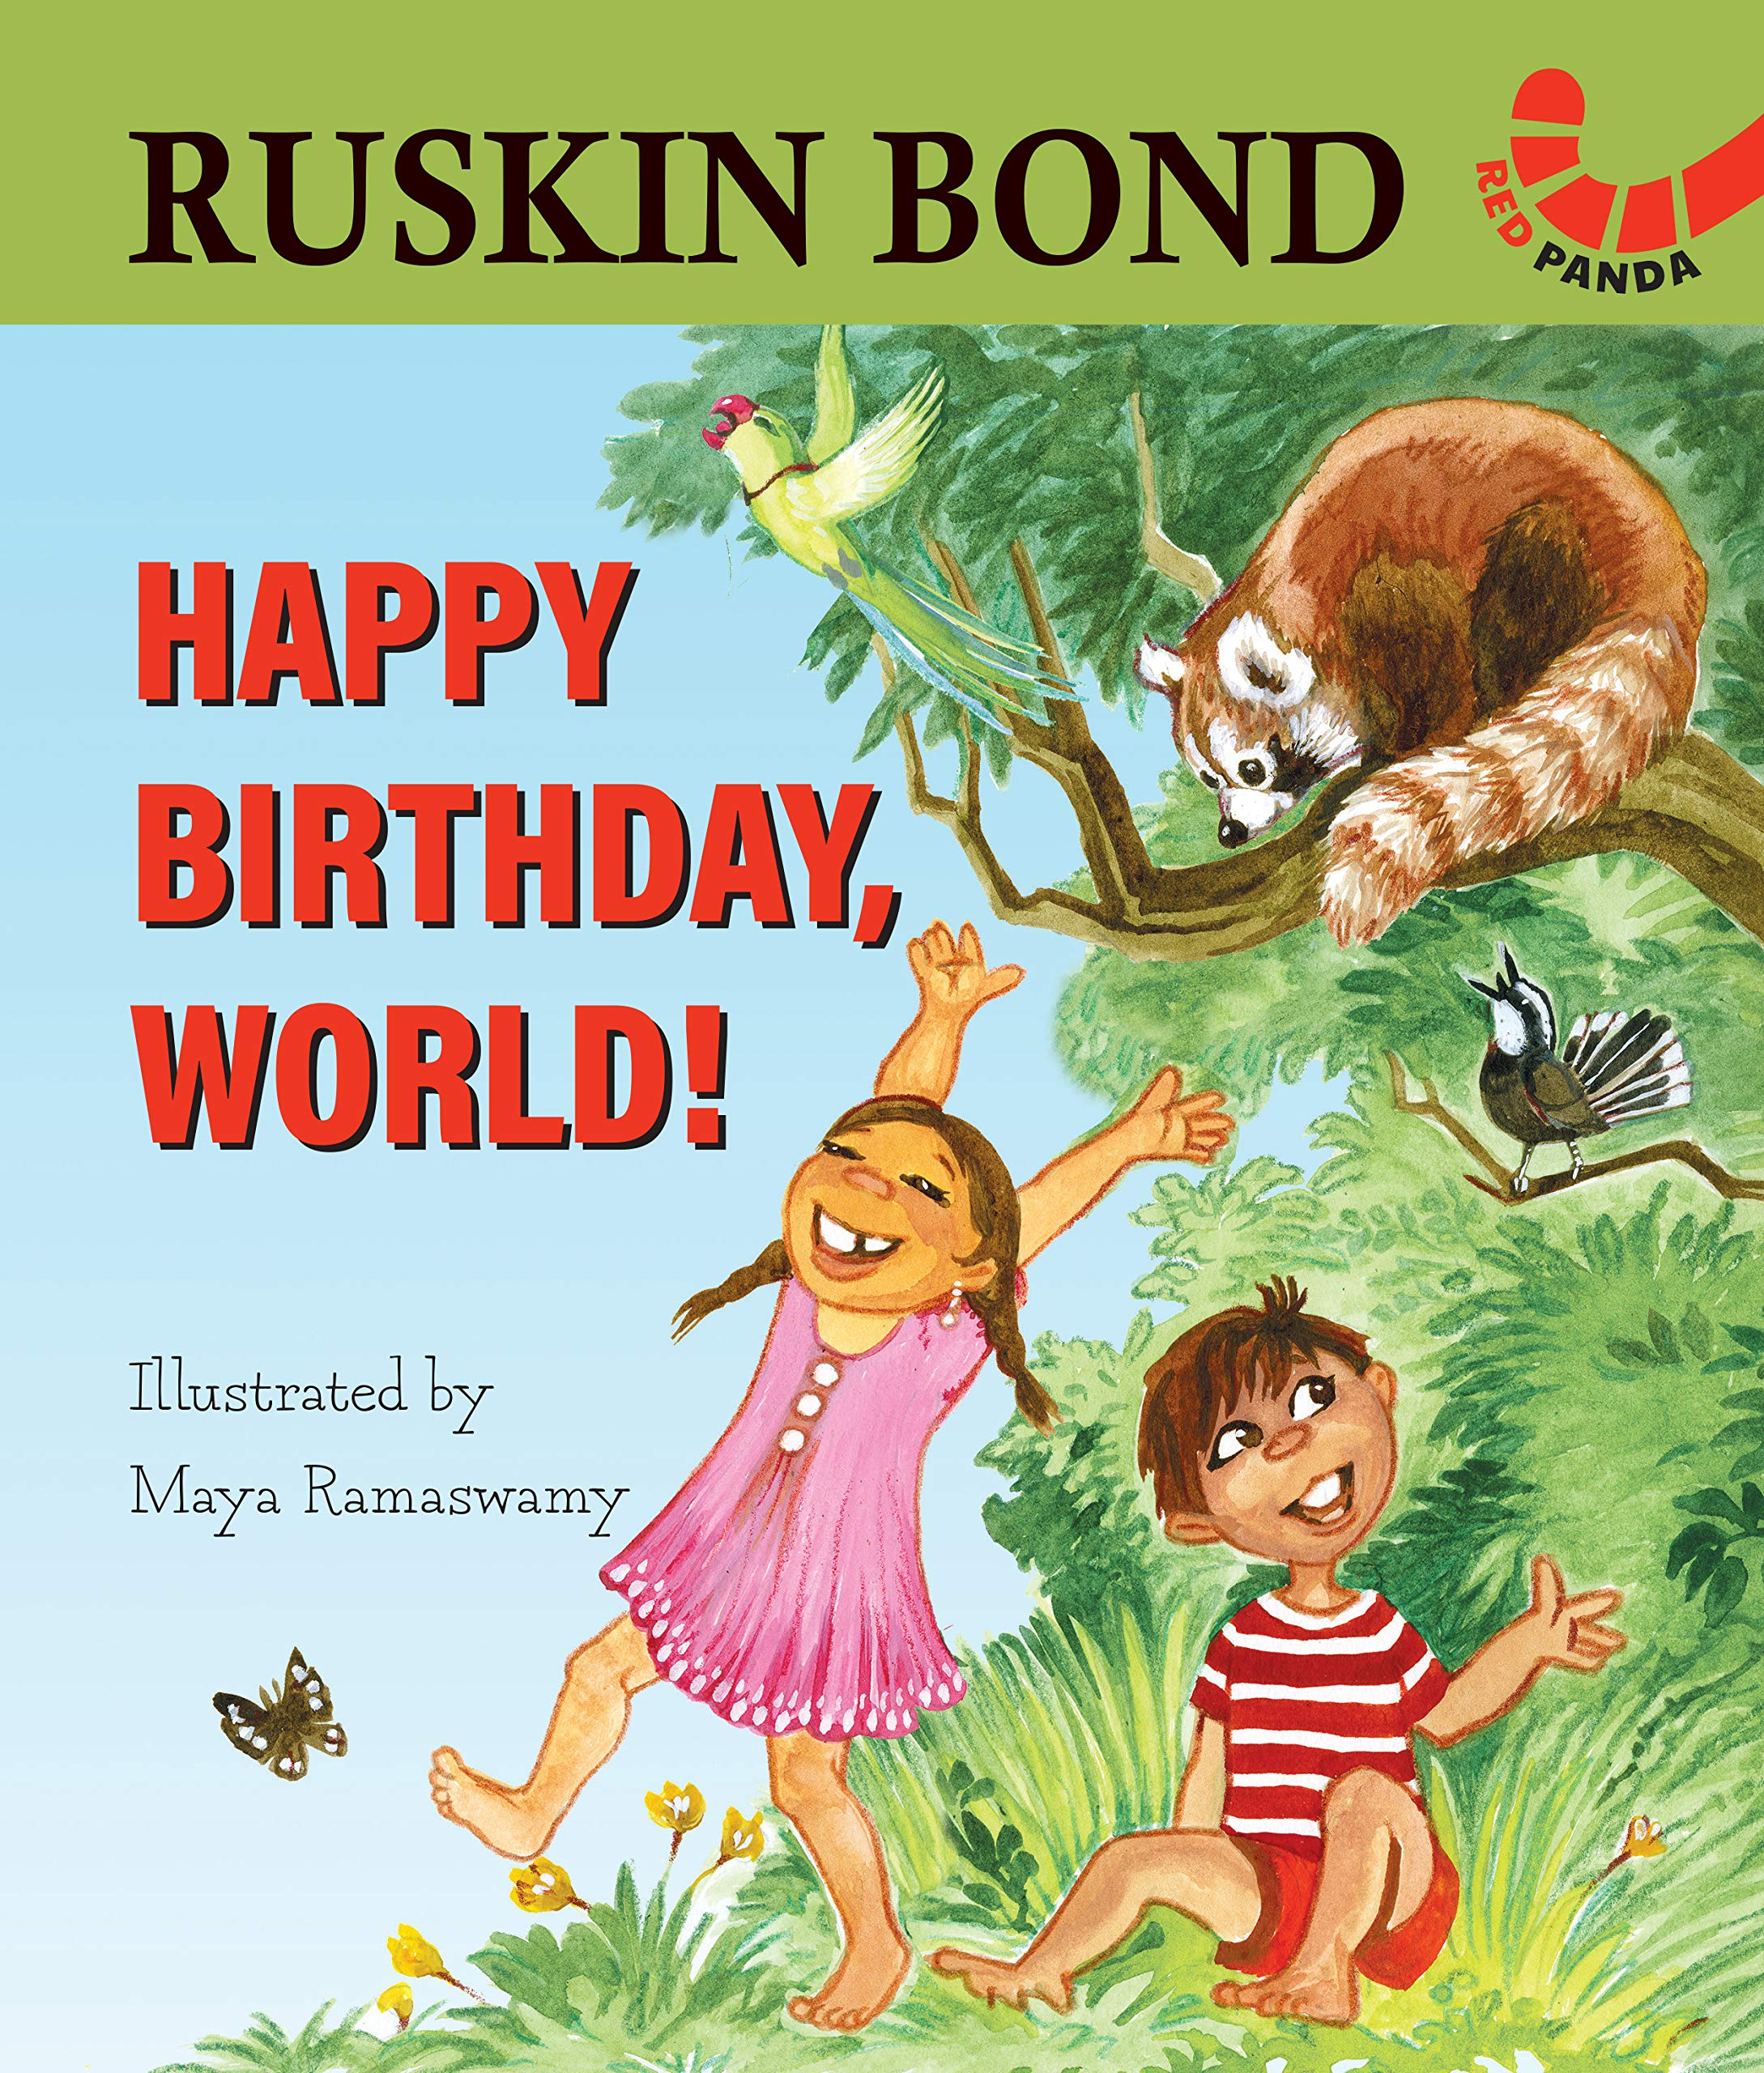 Happy Birthday World! - Ruskin Bond